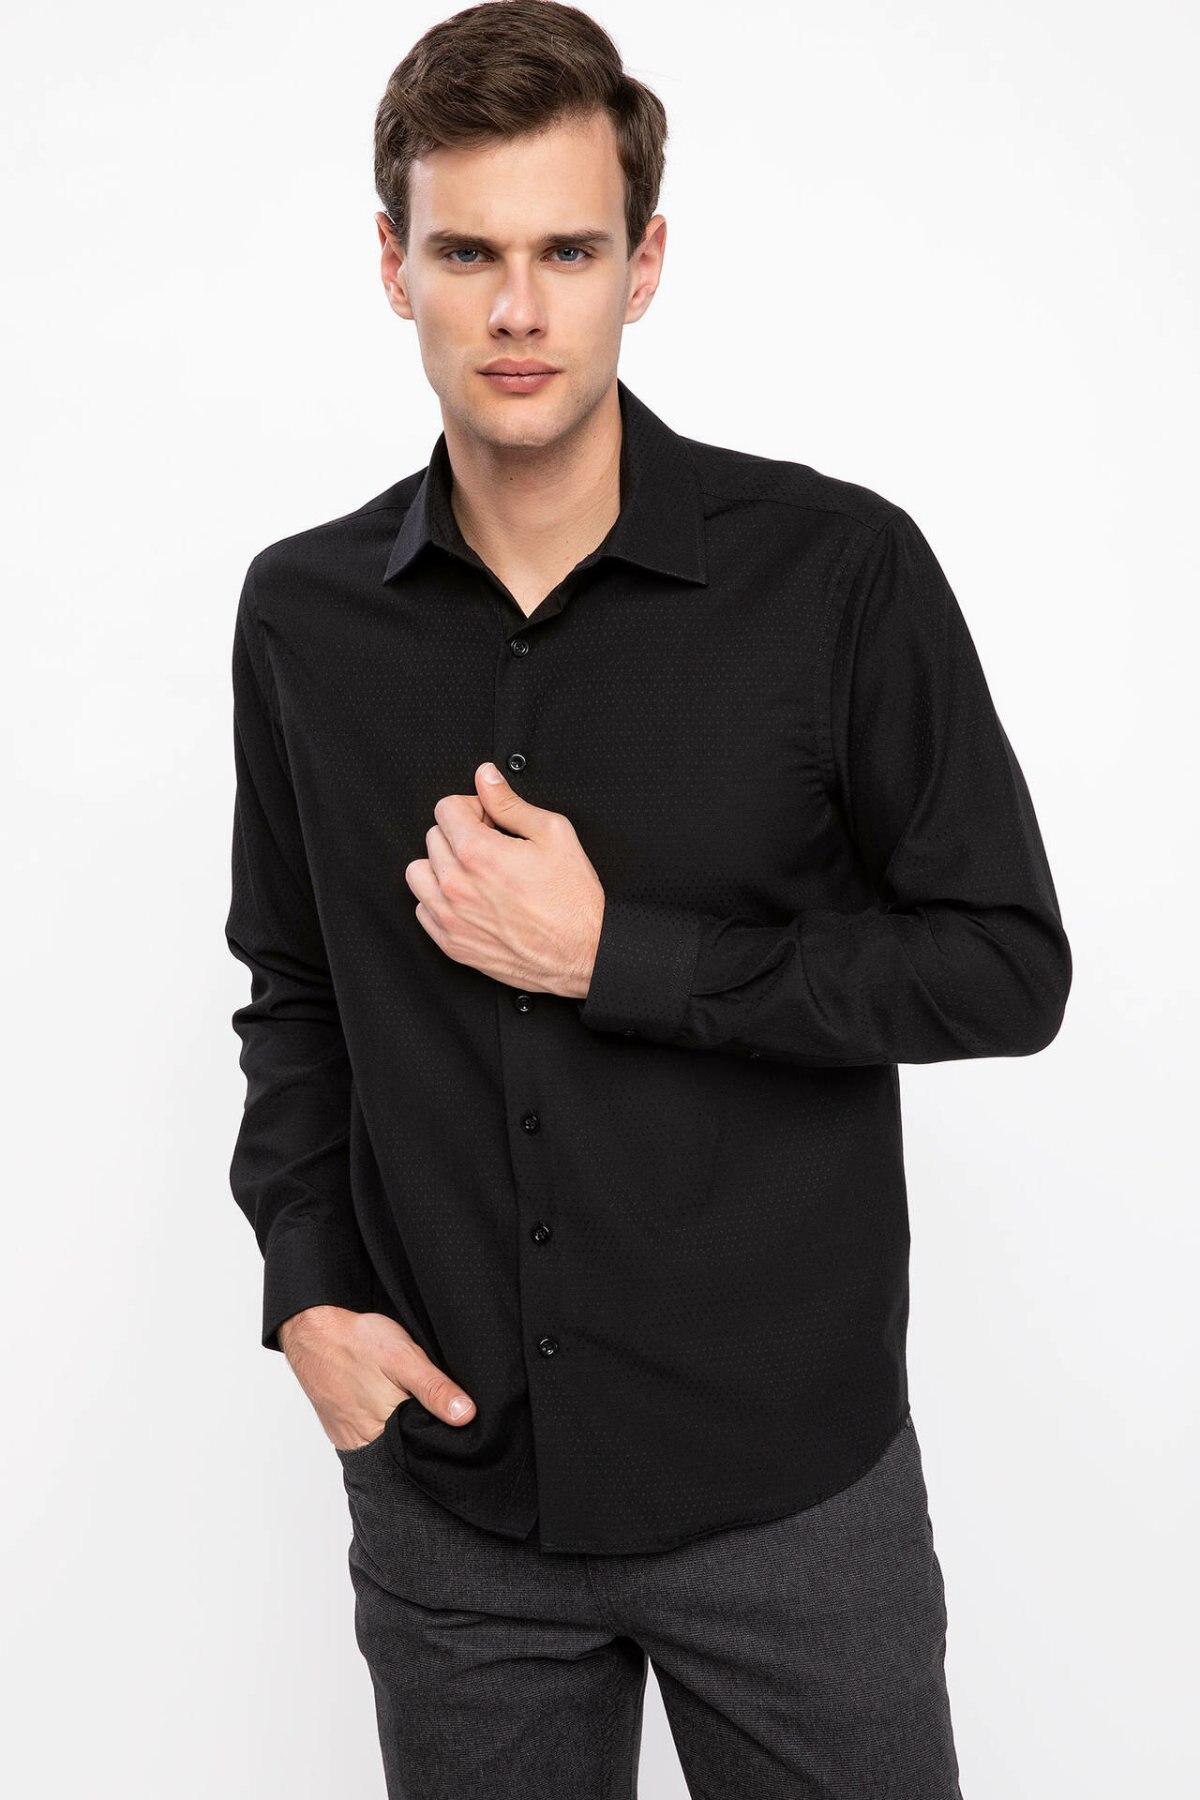 DeFacto Man Long Sleeve Shirt Men Professional White Black Turn-down Collar Shirts Smart Casual Tops For Work-K6466AZ18CW